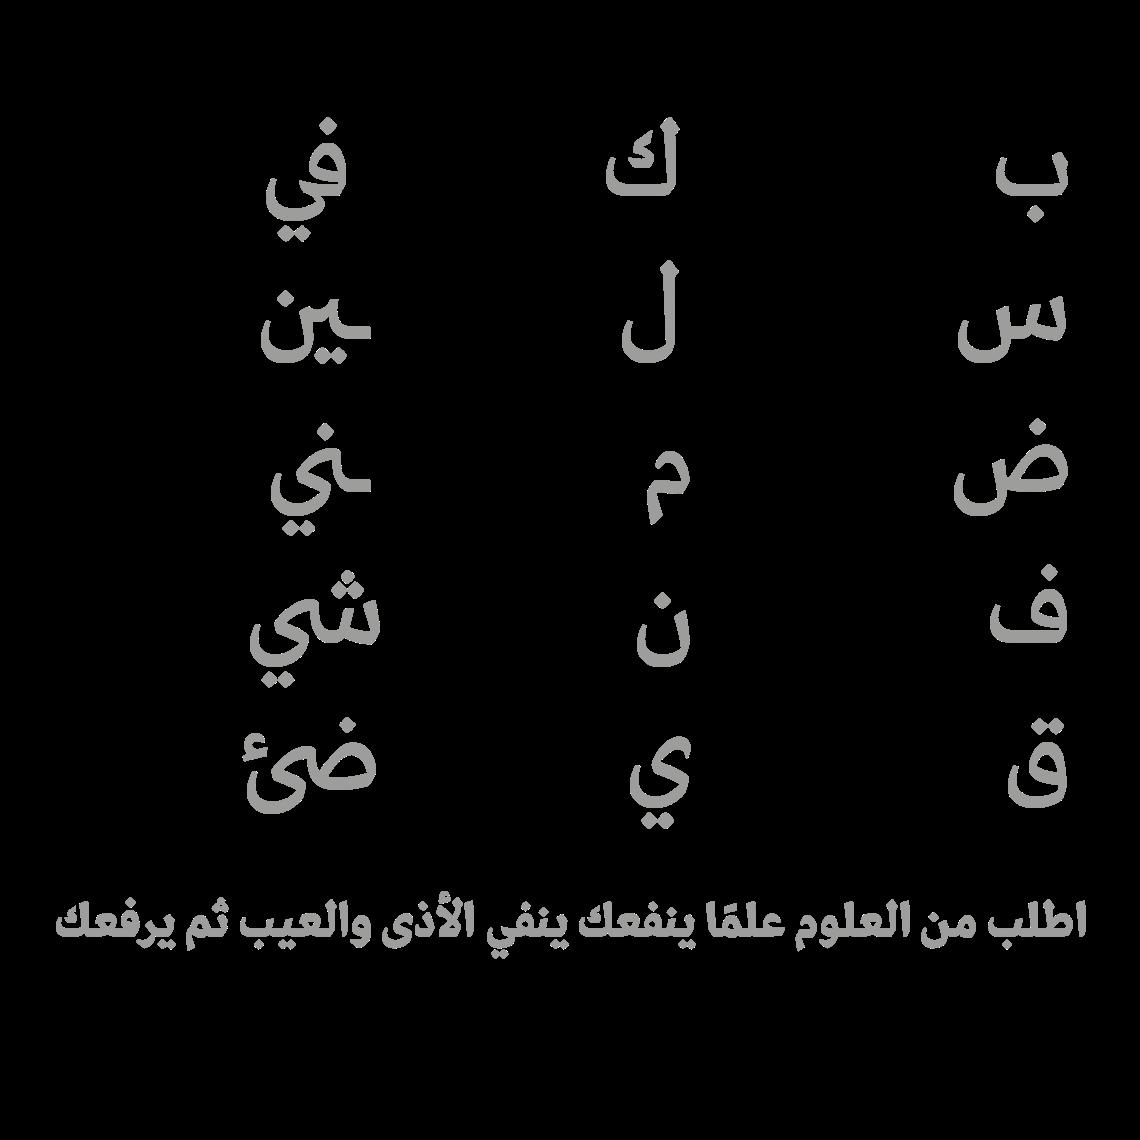 29LT-Zarid-Text-Image-10